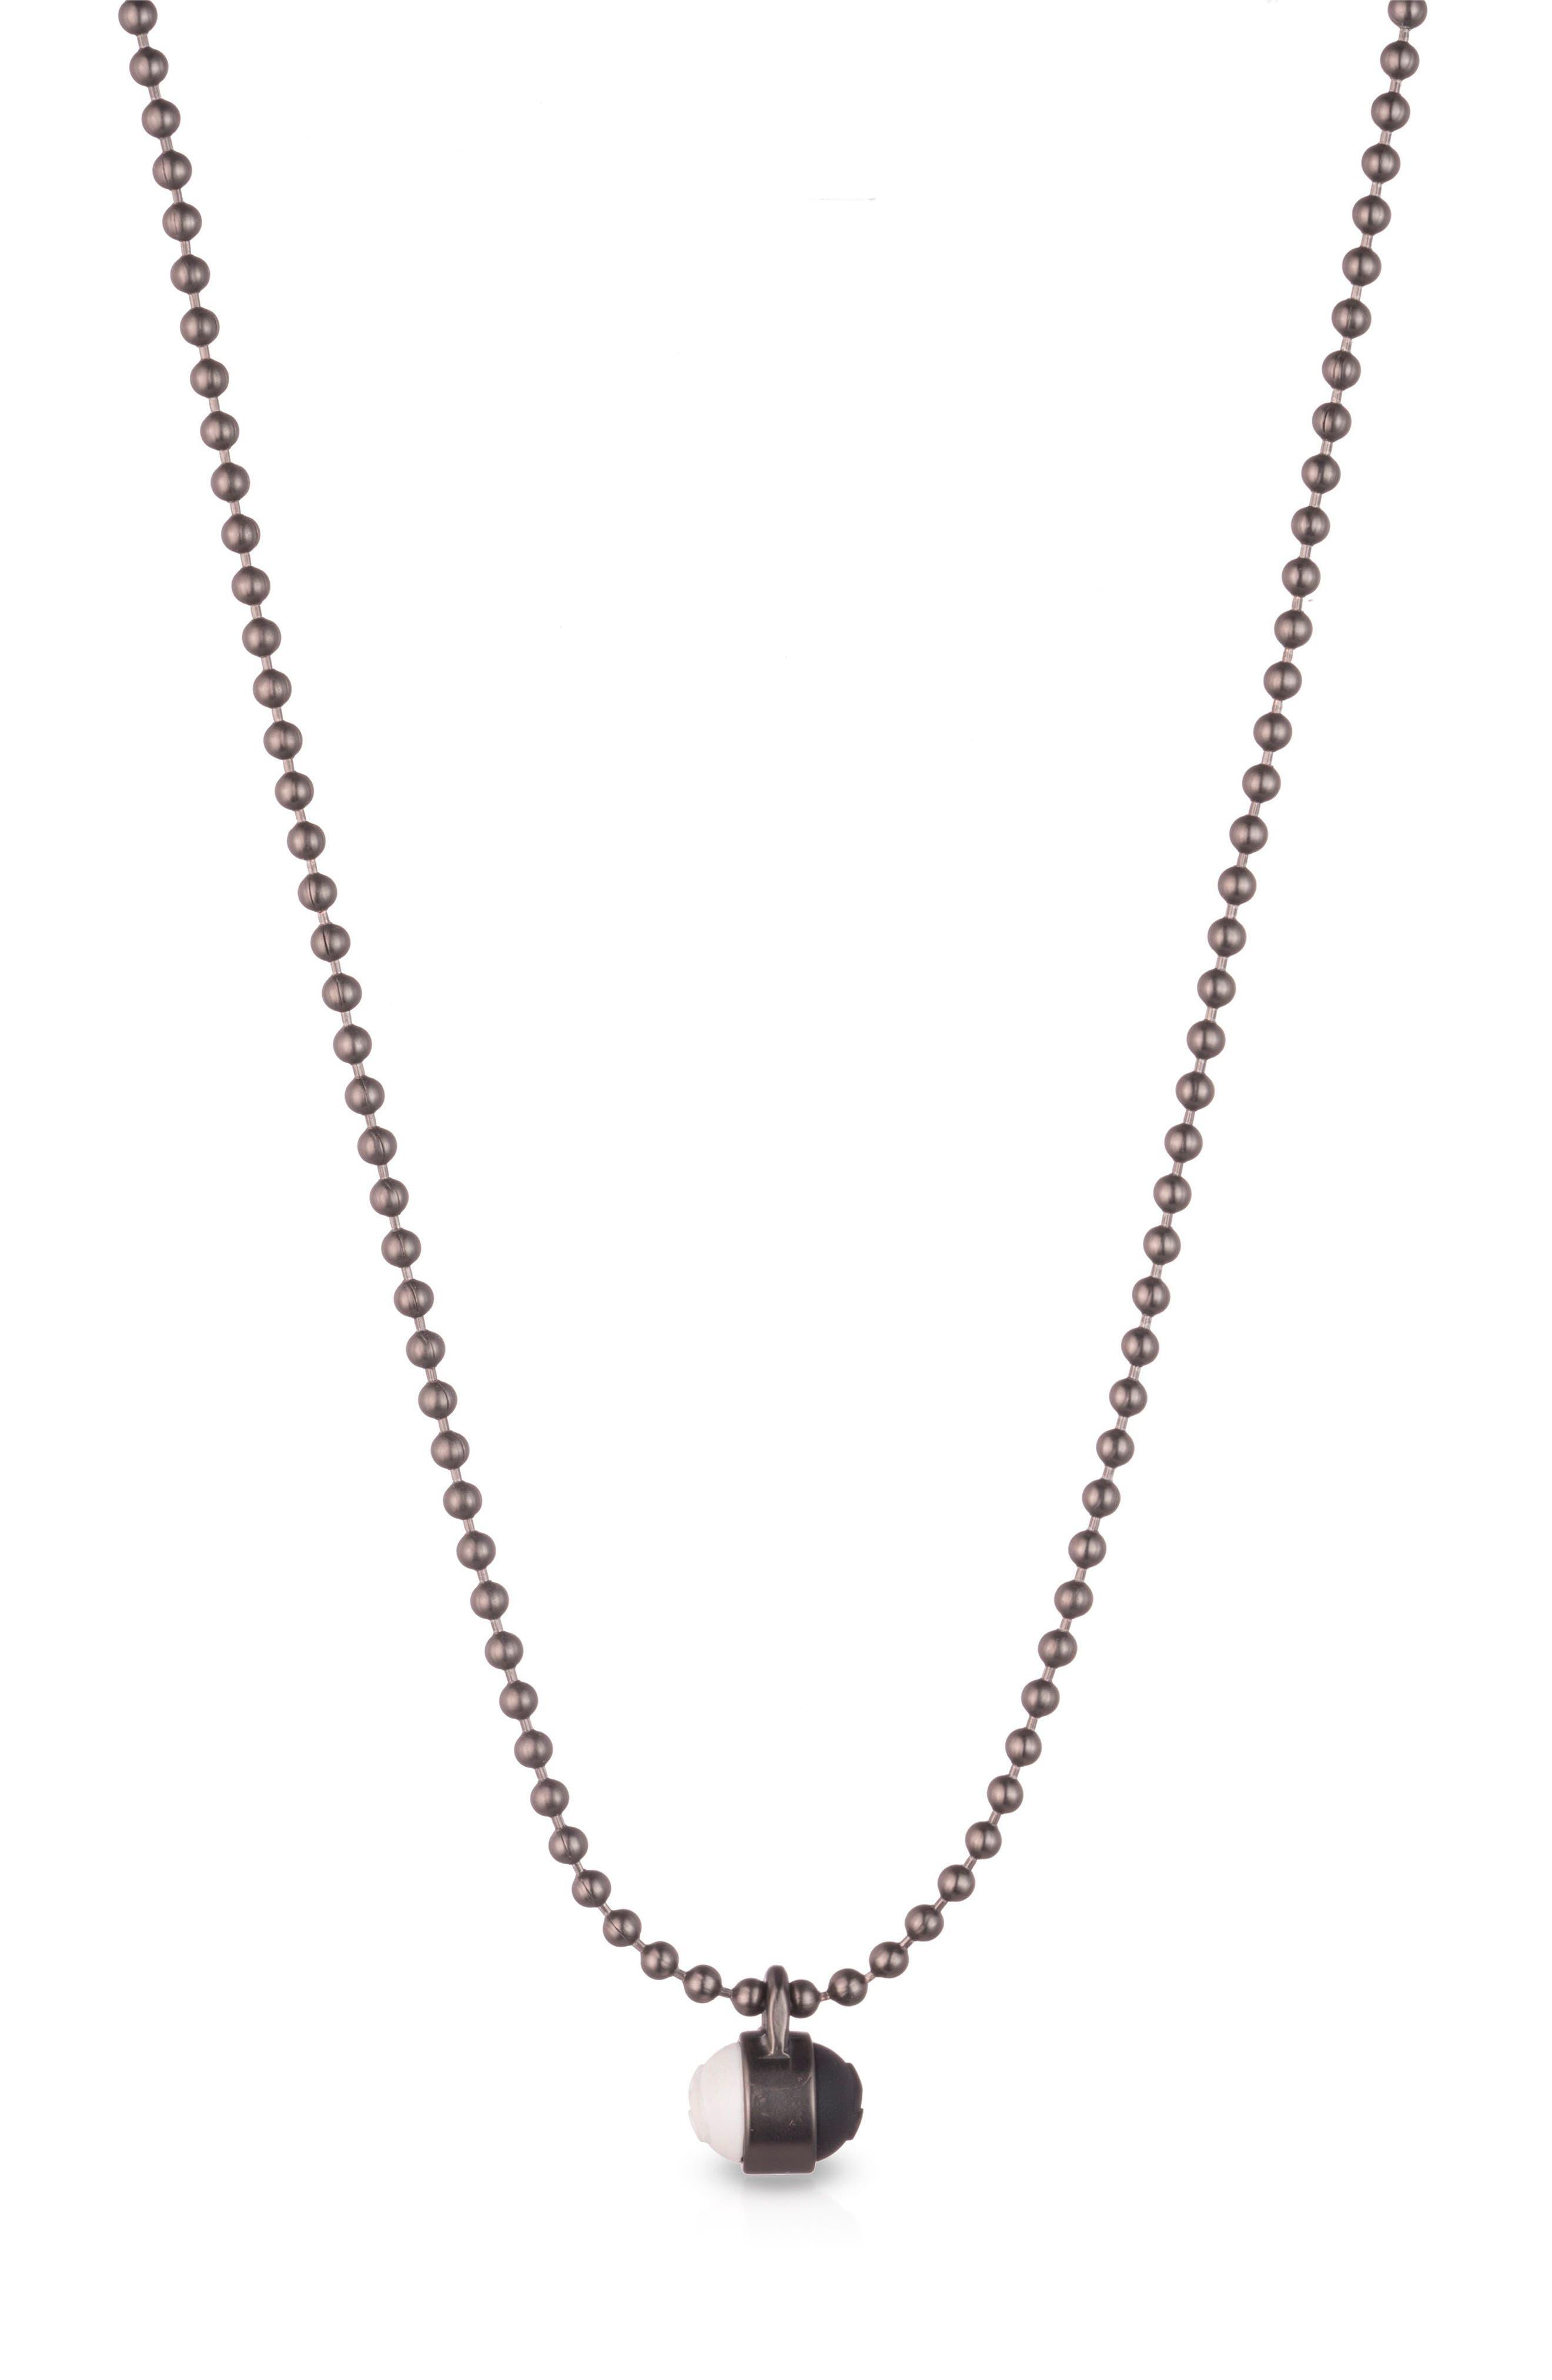 Pendant Ball Chain Necklace,                             Main thumbnail 1, color,